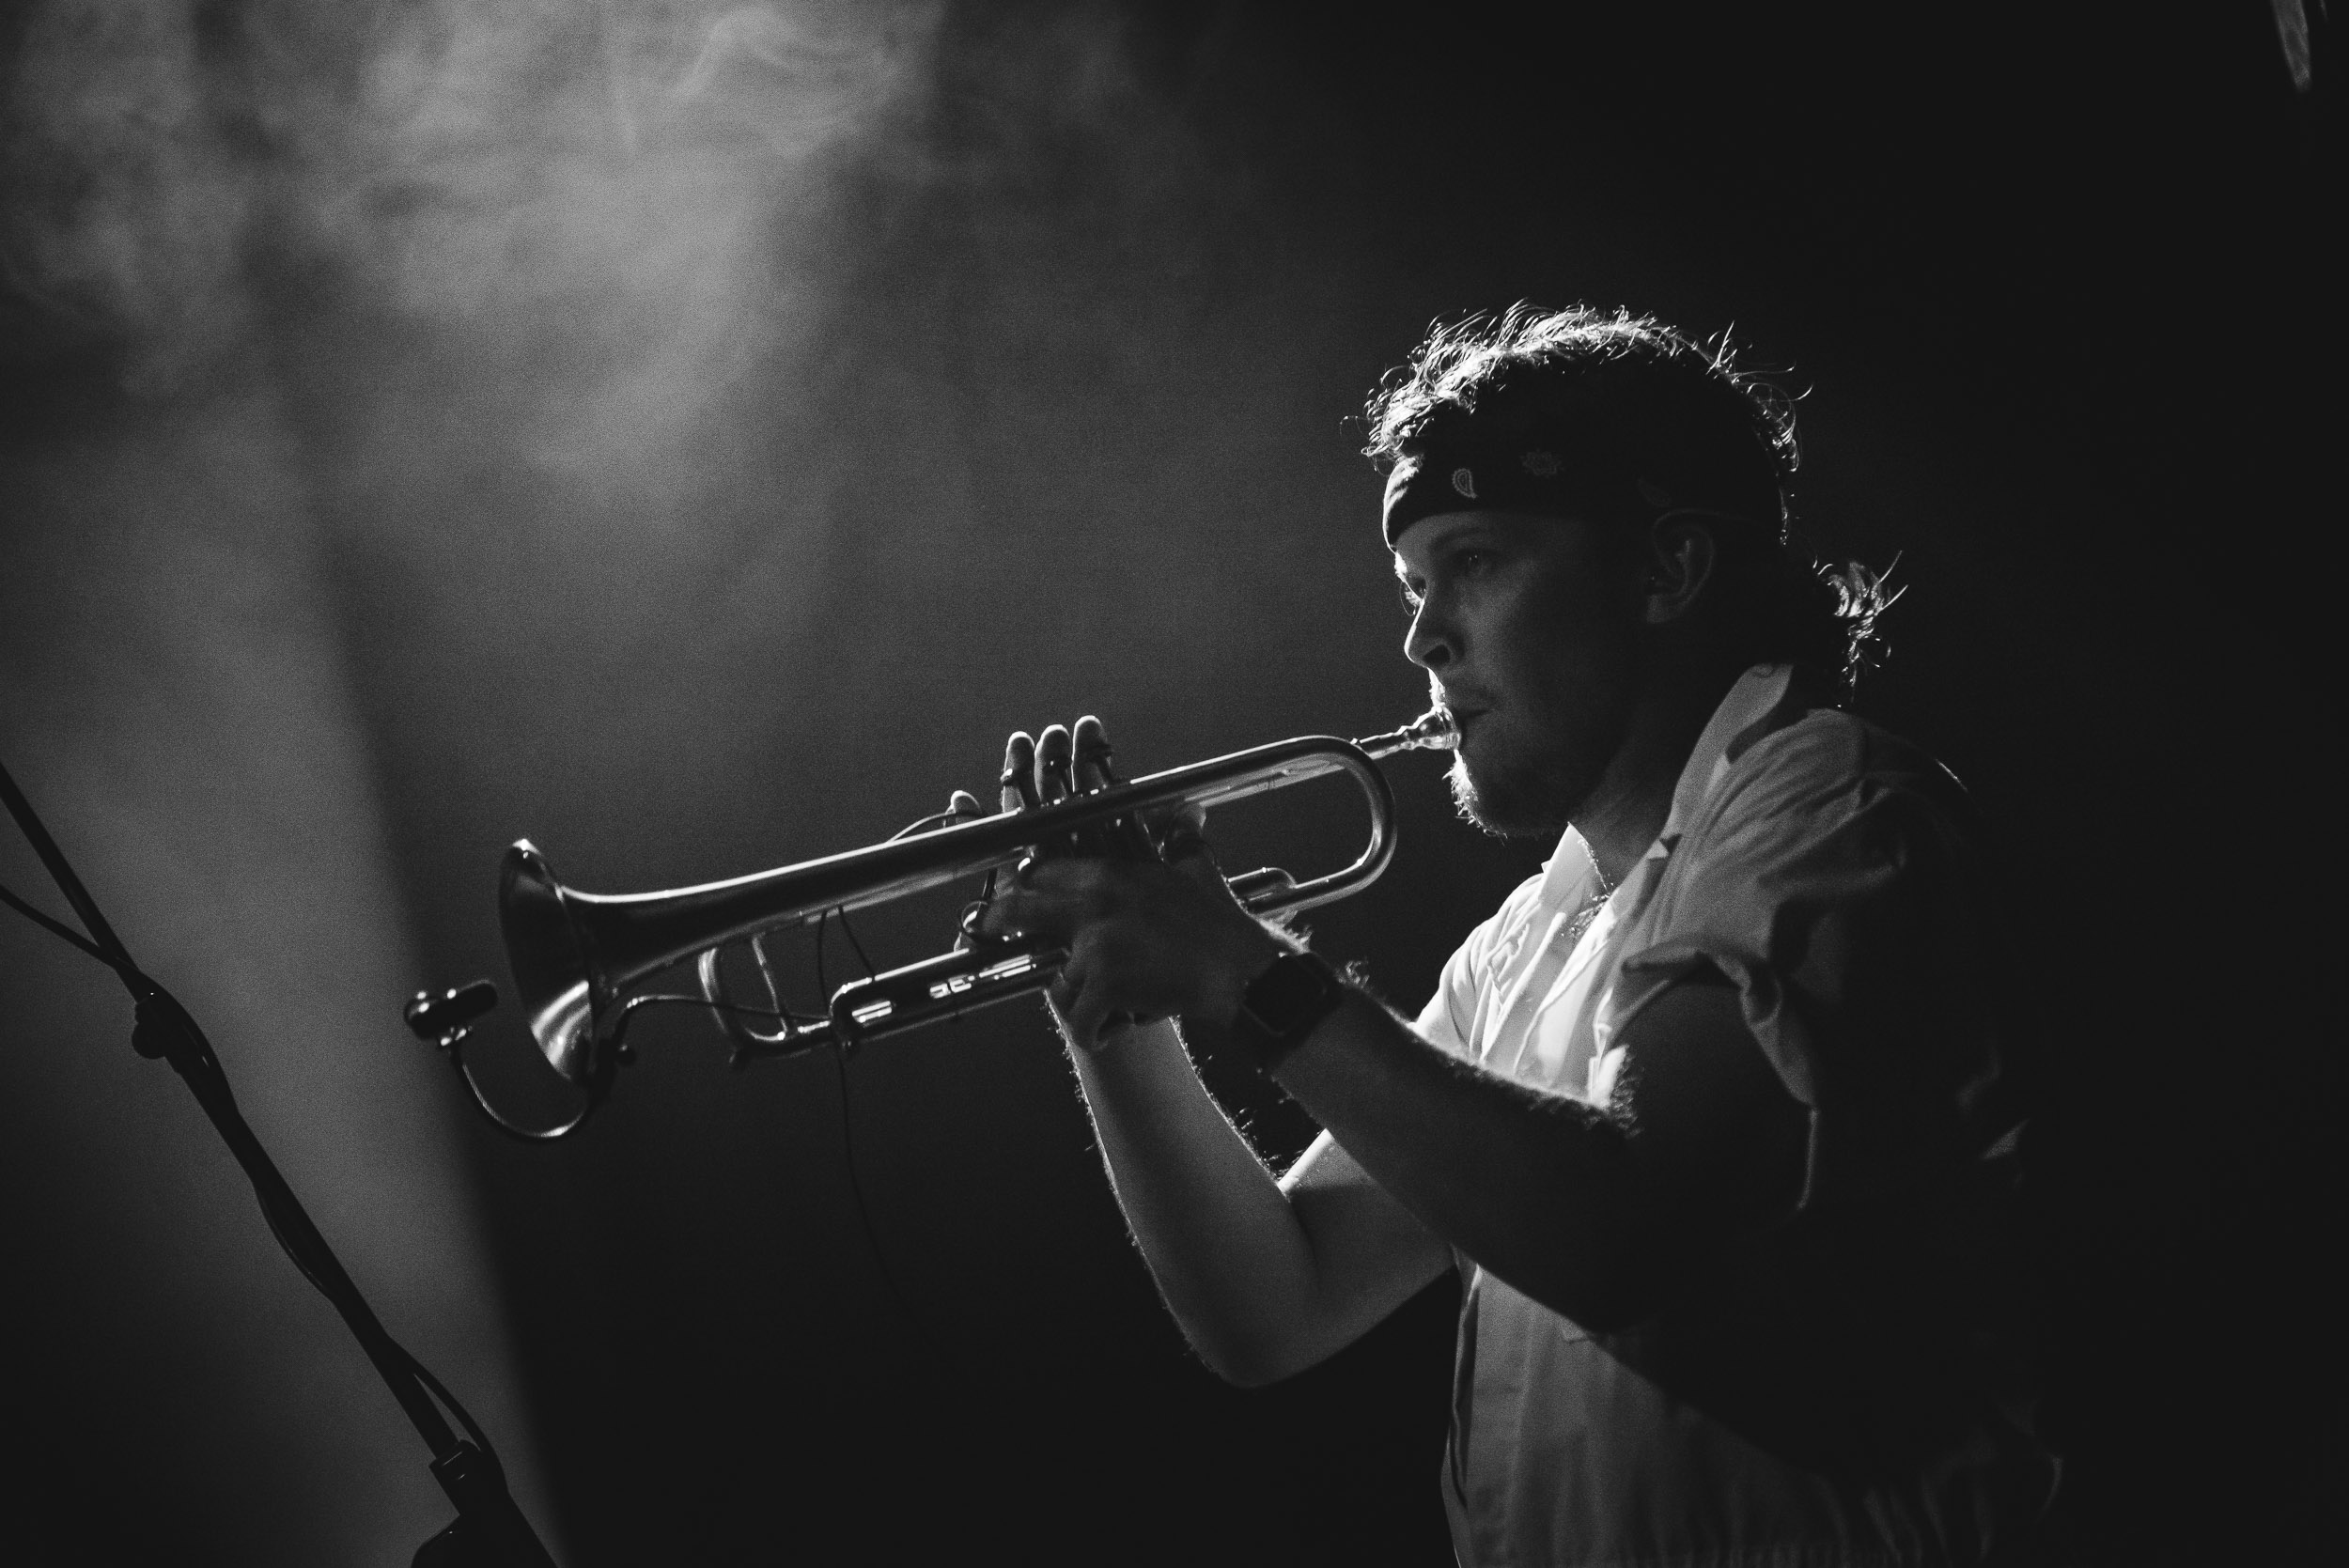 Brass-Against-Tomas-Valnoha-9-.jpg